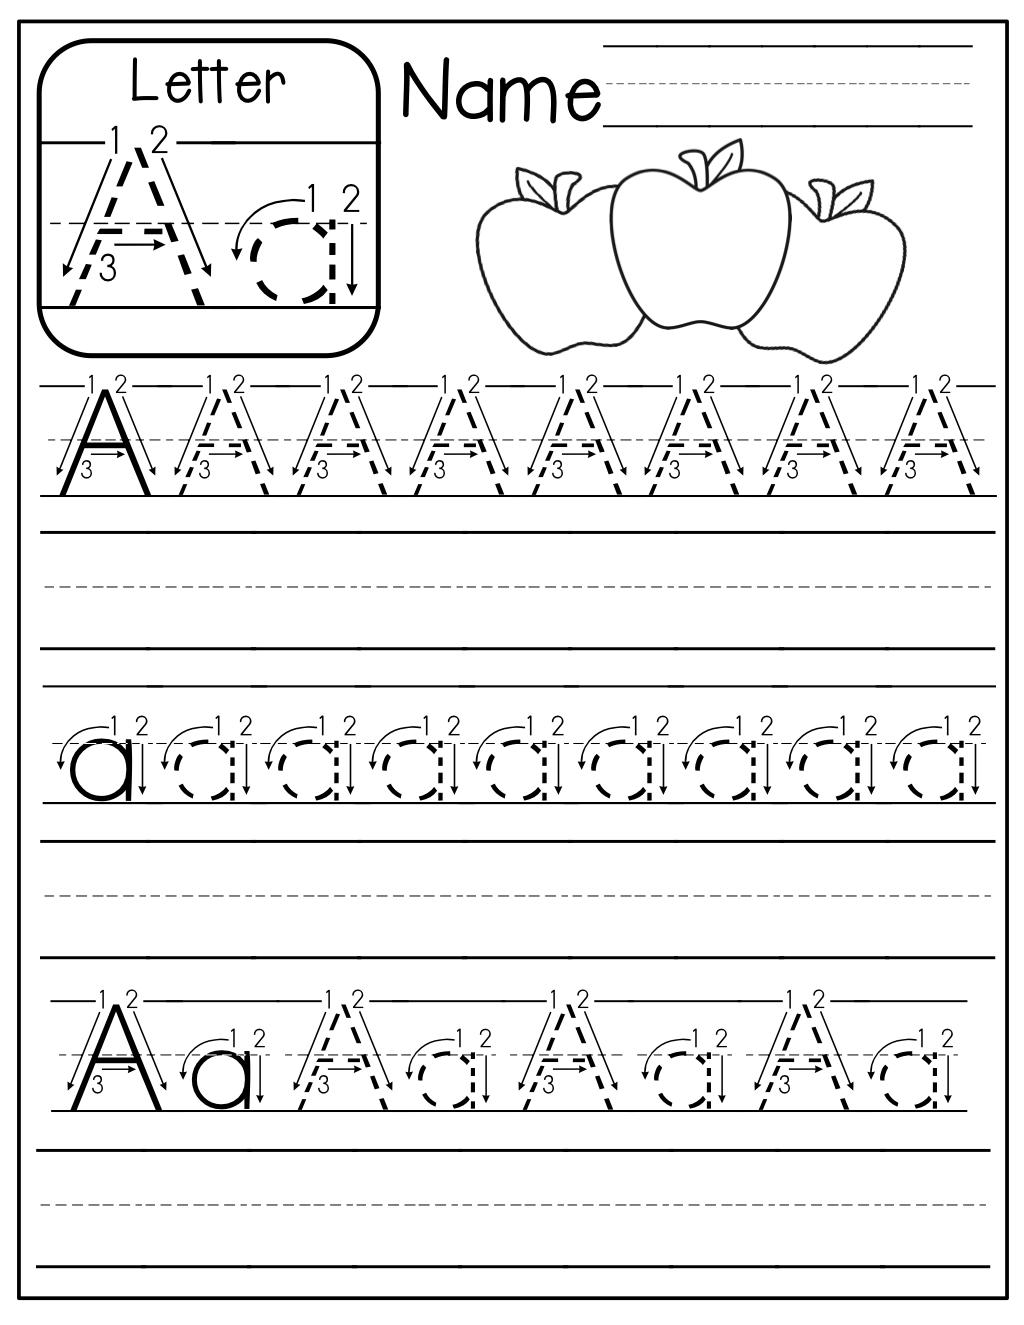 Free Free Free Handwriting Tracing Sheets Kindergarten Writing Alphabet Preschool Writing Practice [ 1325 x 1024 Pixel ]